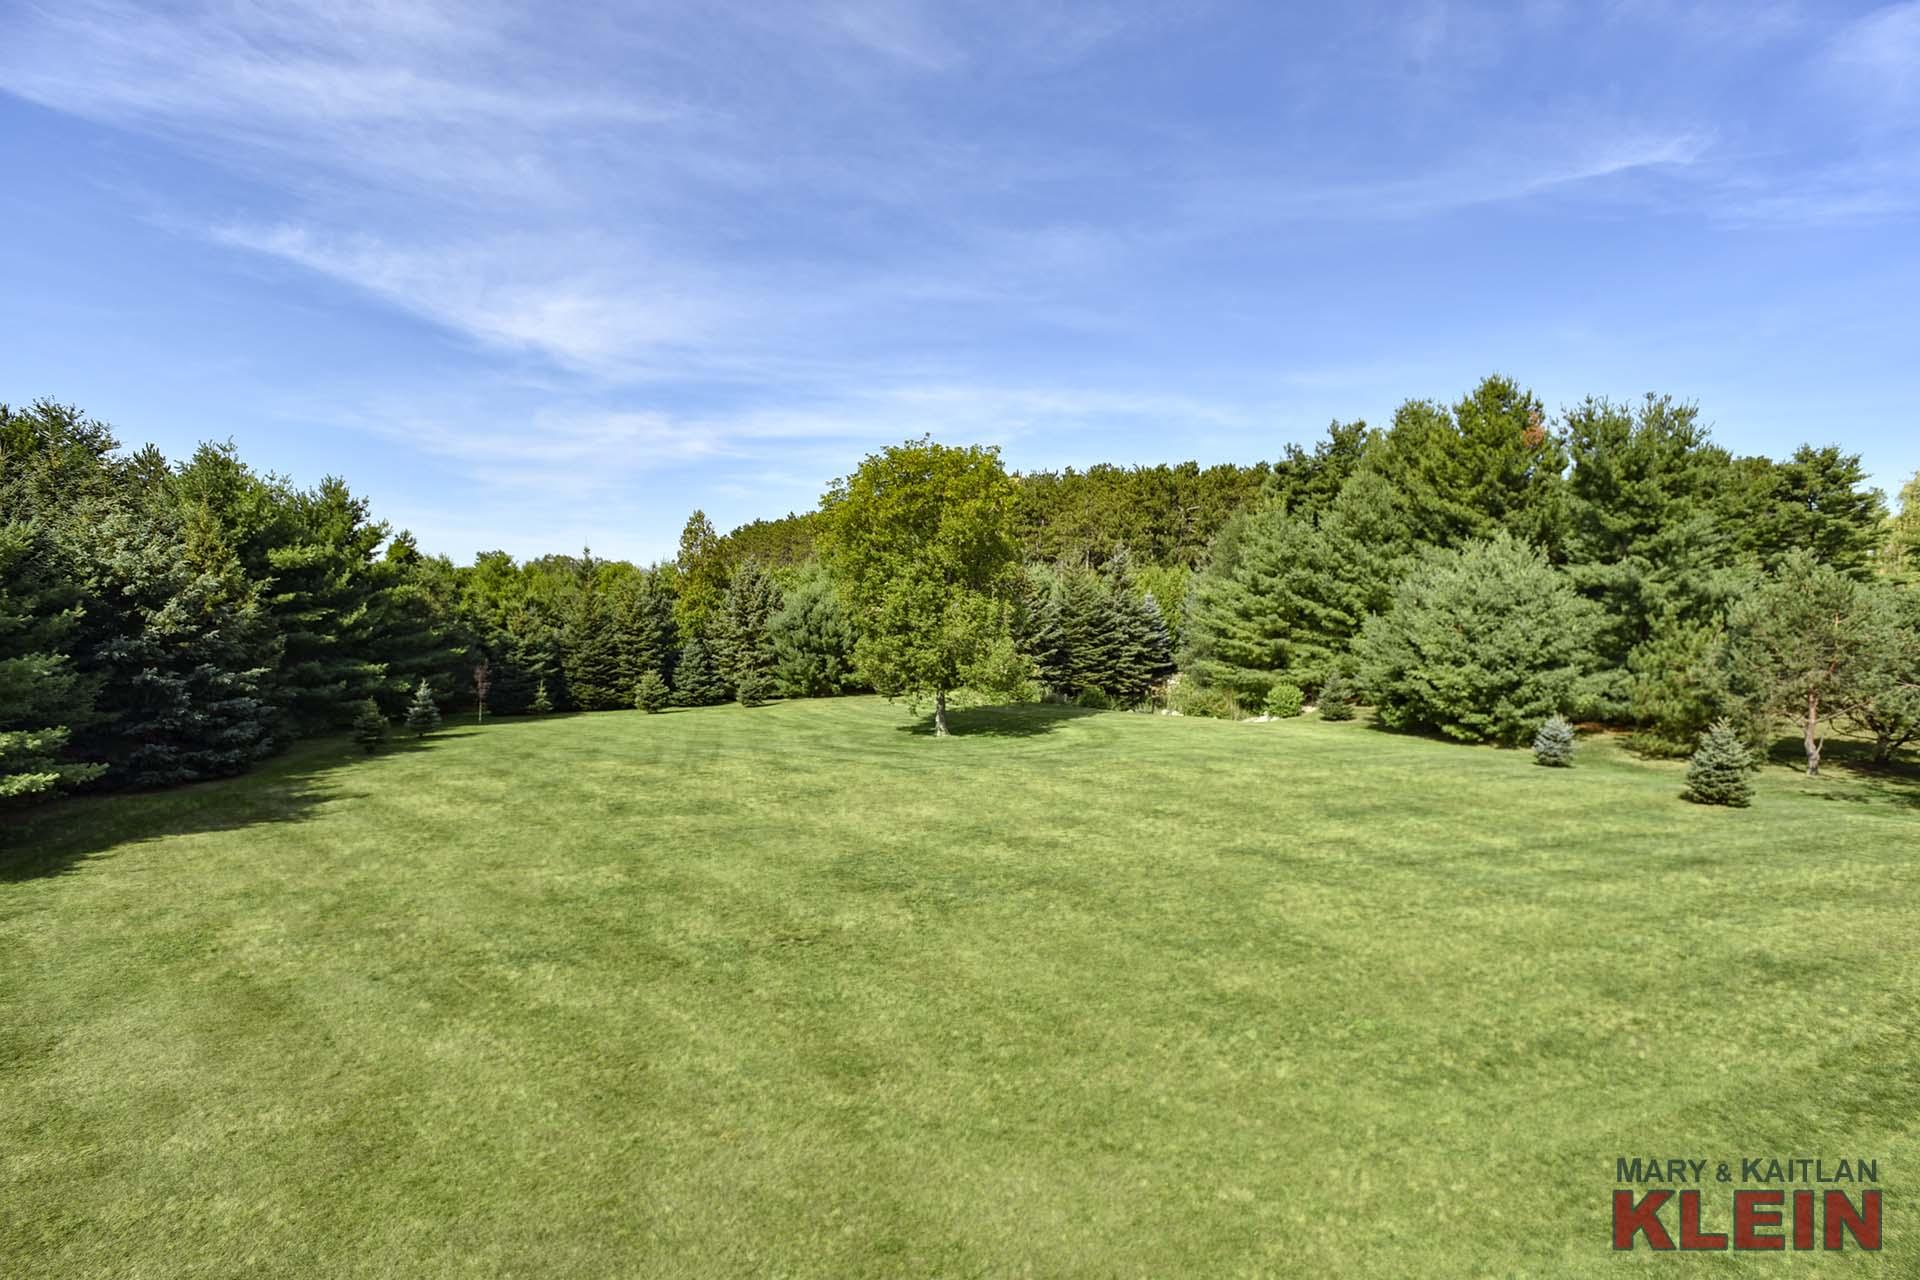 West-Facing Backyard